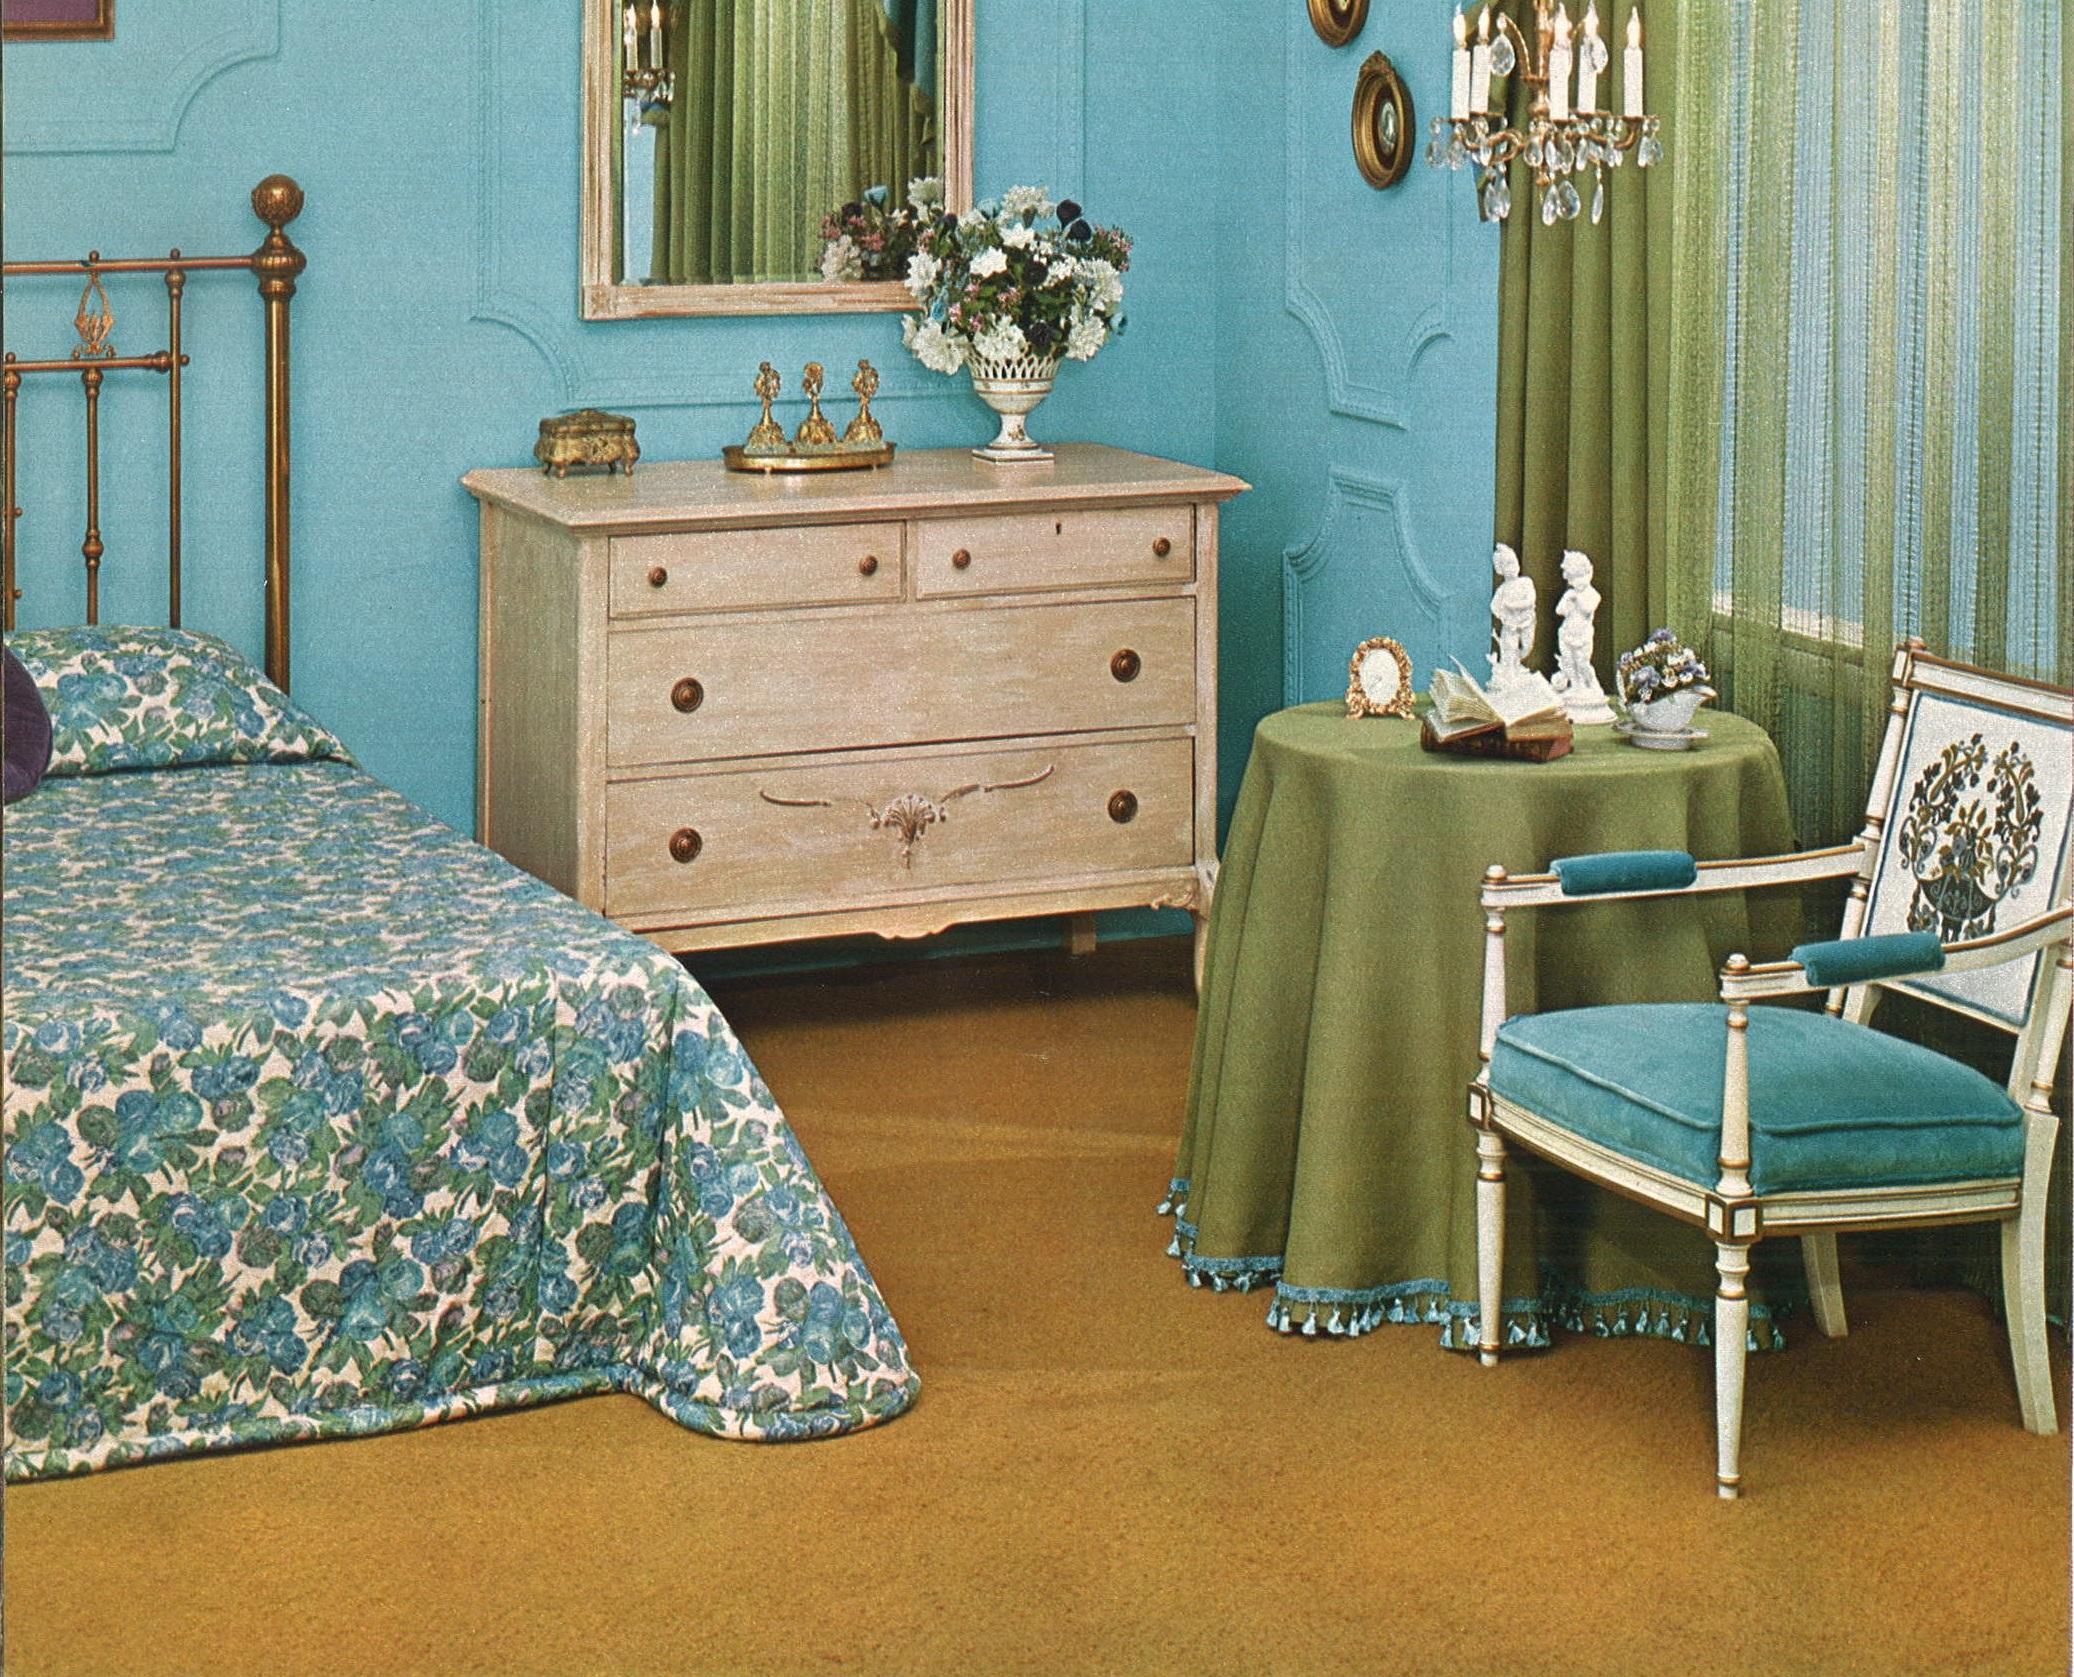 Uncategorized britannica home fashions tencel sheets - 3087_001